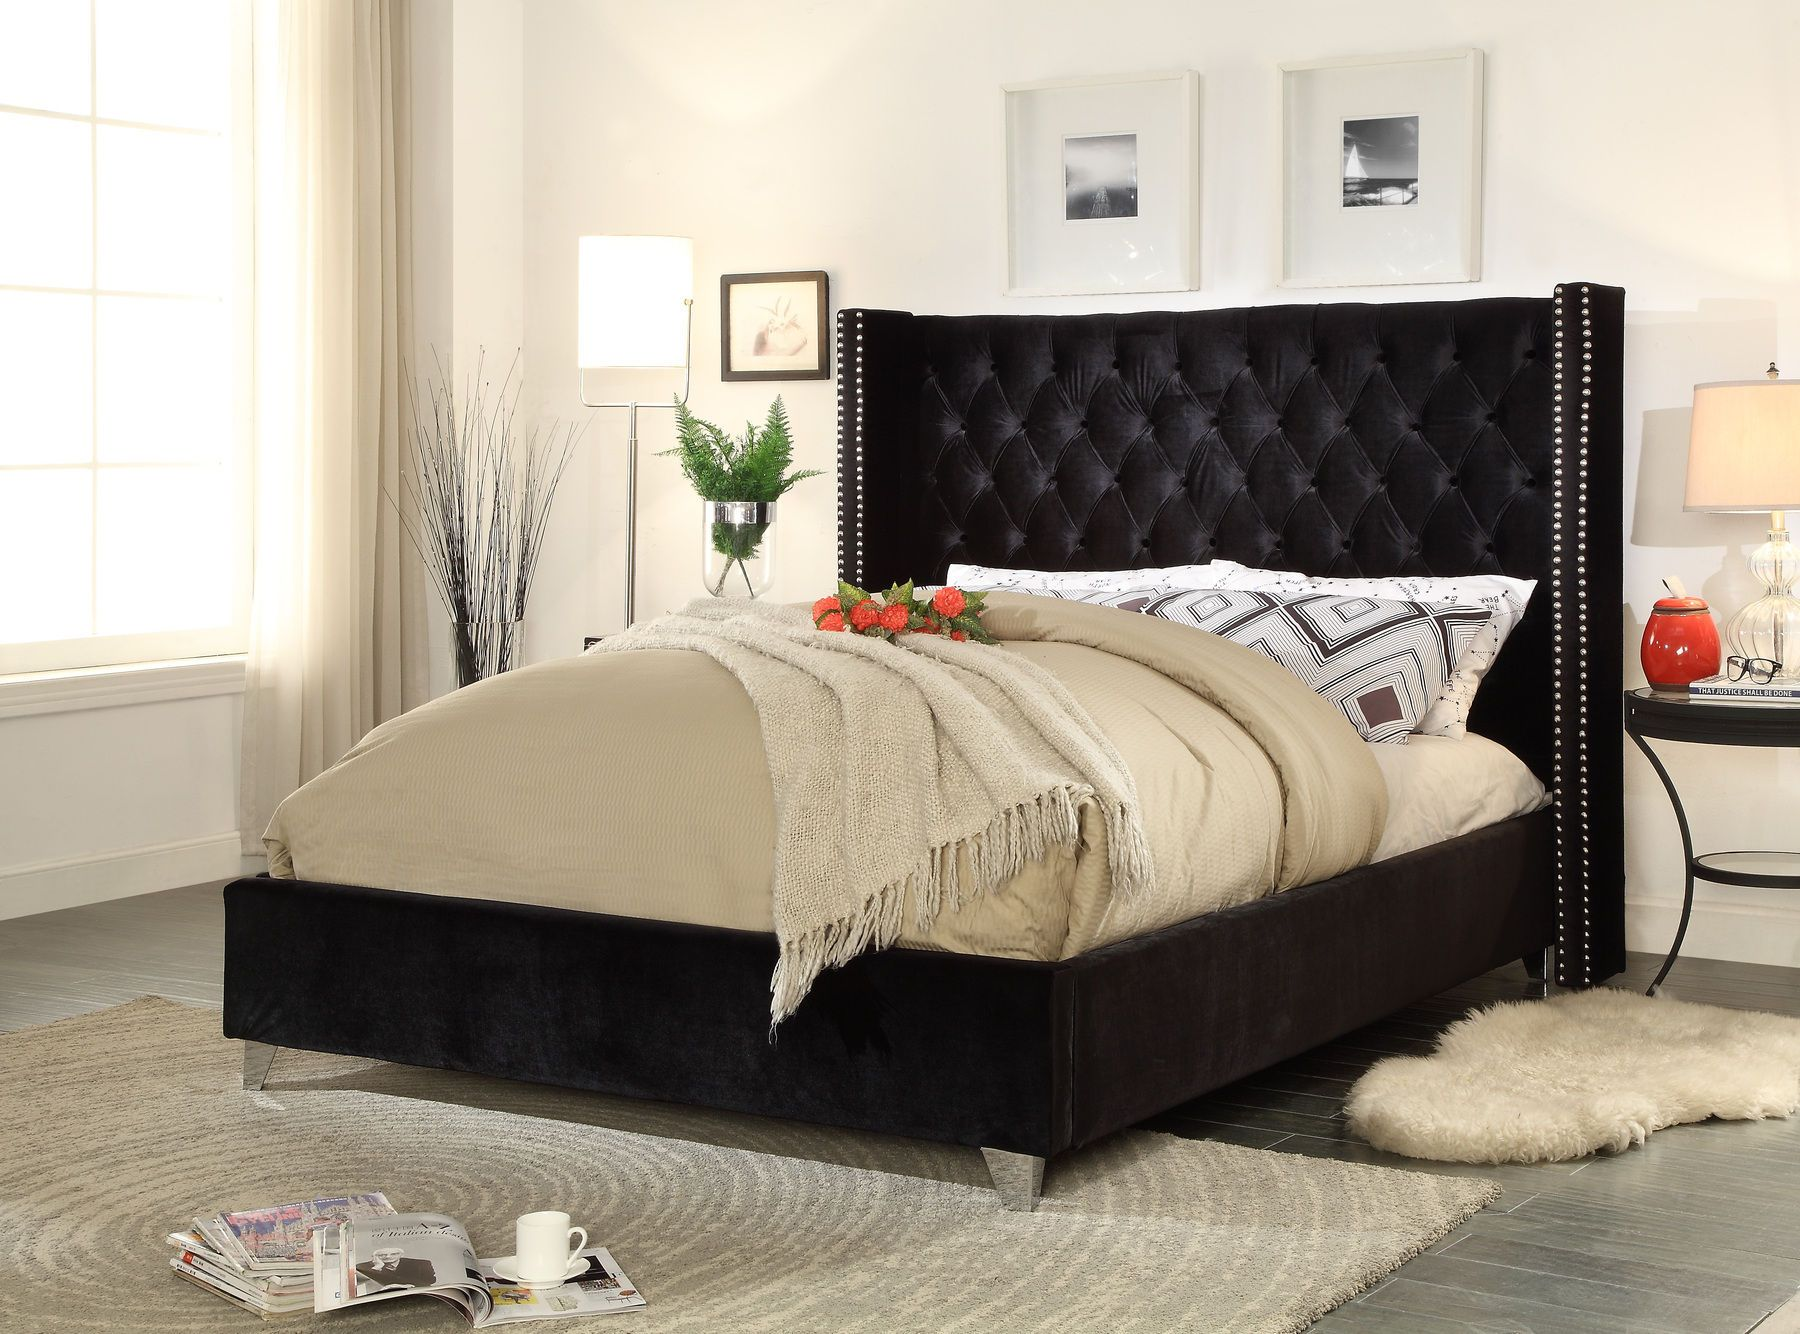 Aiden Black Full Size Bed All Modern Furniture Black Headboard